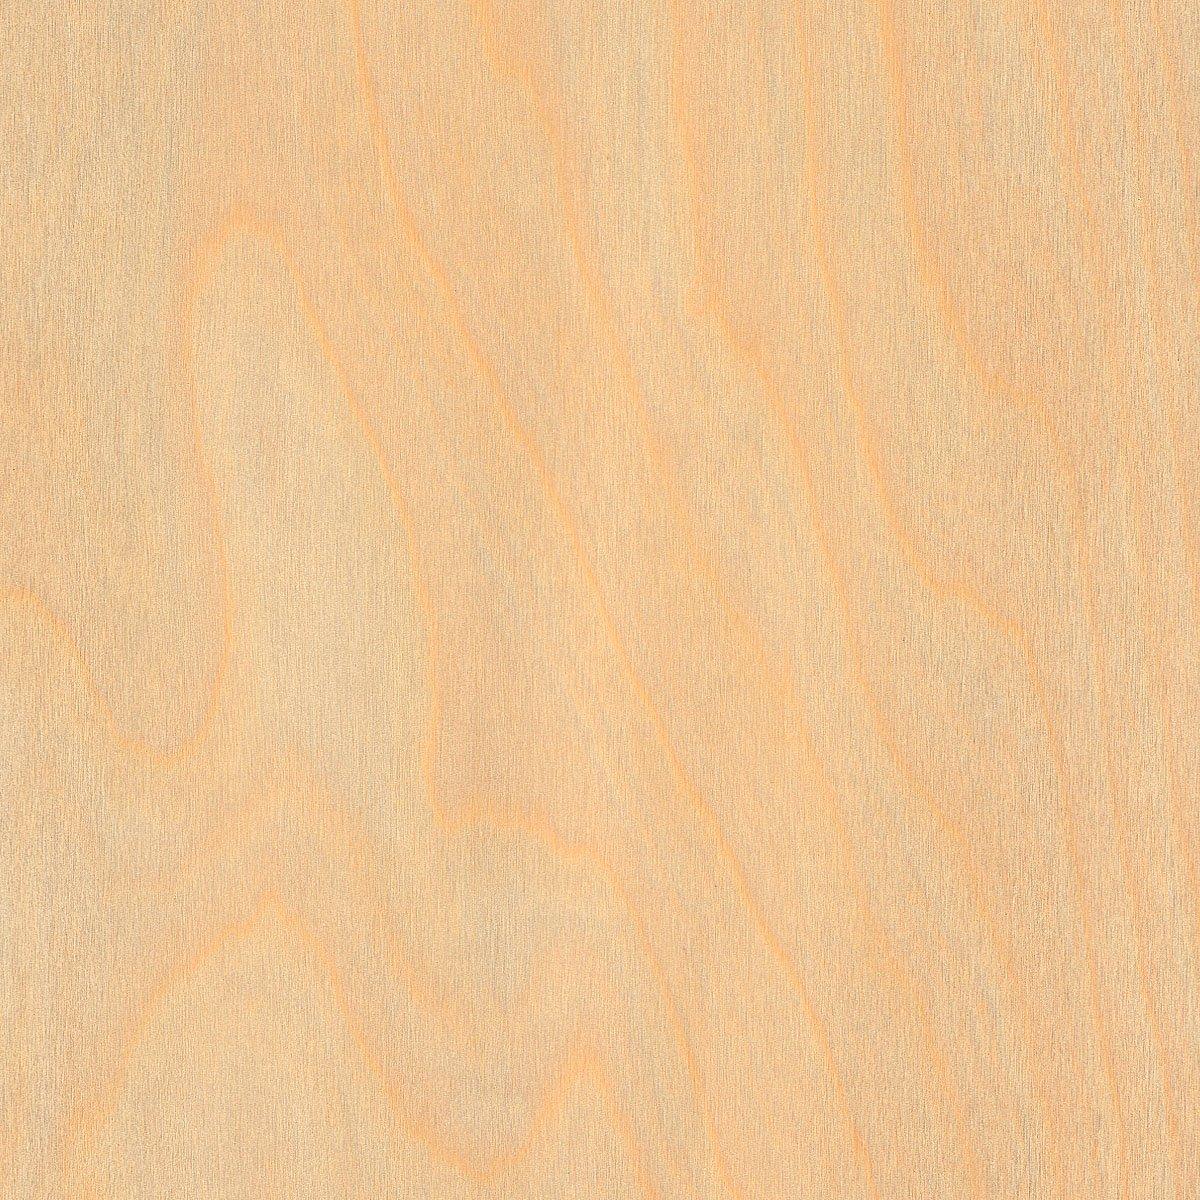 Birch White Wood Veneer Rotary Spliced 4'x8' 10 mil(Paperback) Sheet Wood-All